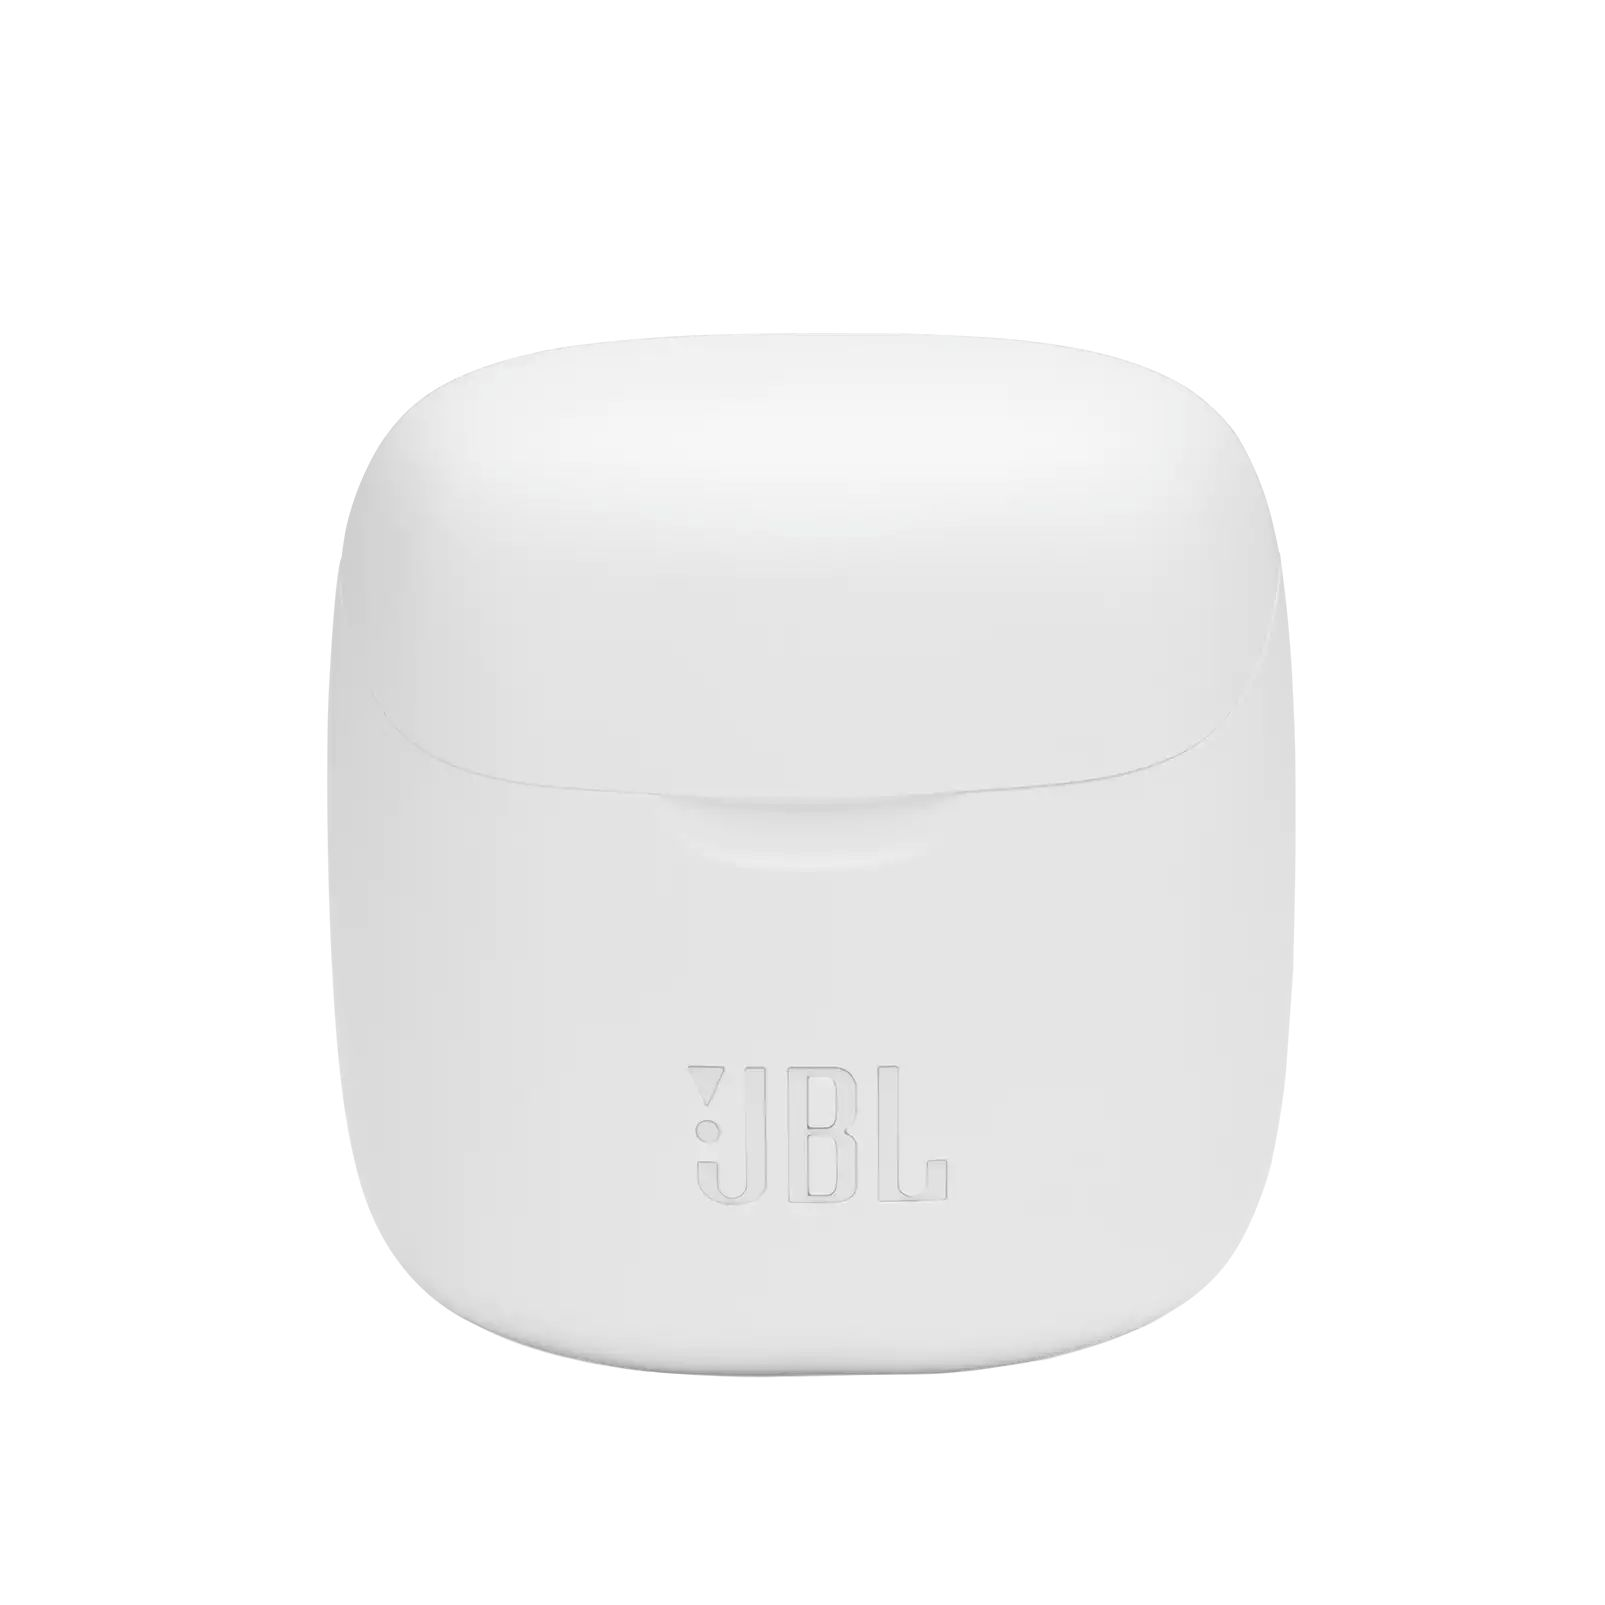 Fone de Ouvido Bluetooth JBL Tune 220TWS - Branco JBLT220TWSWHT